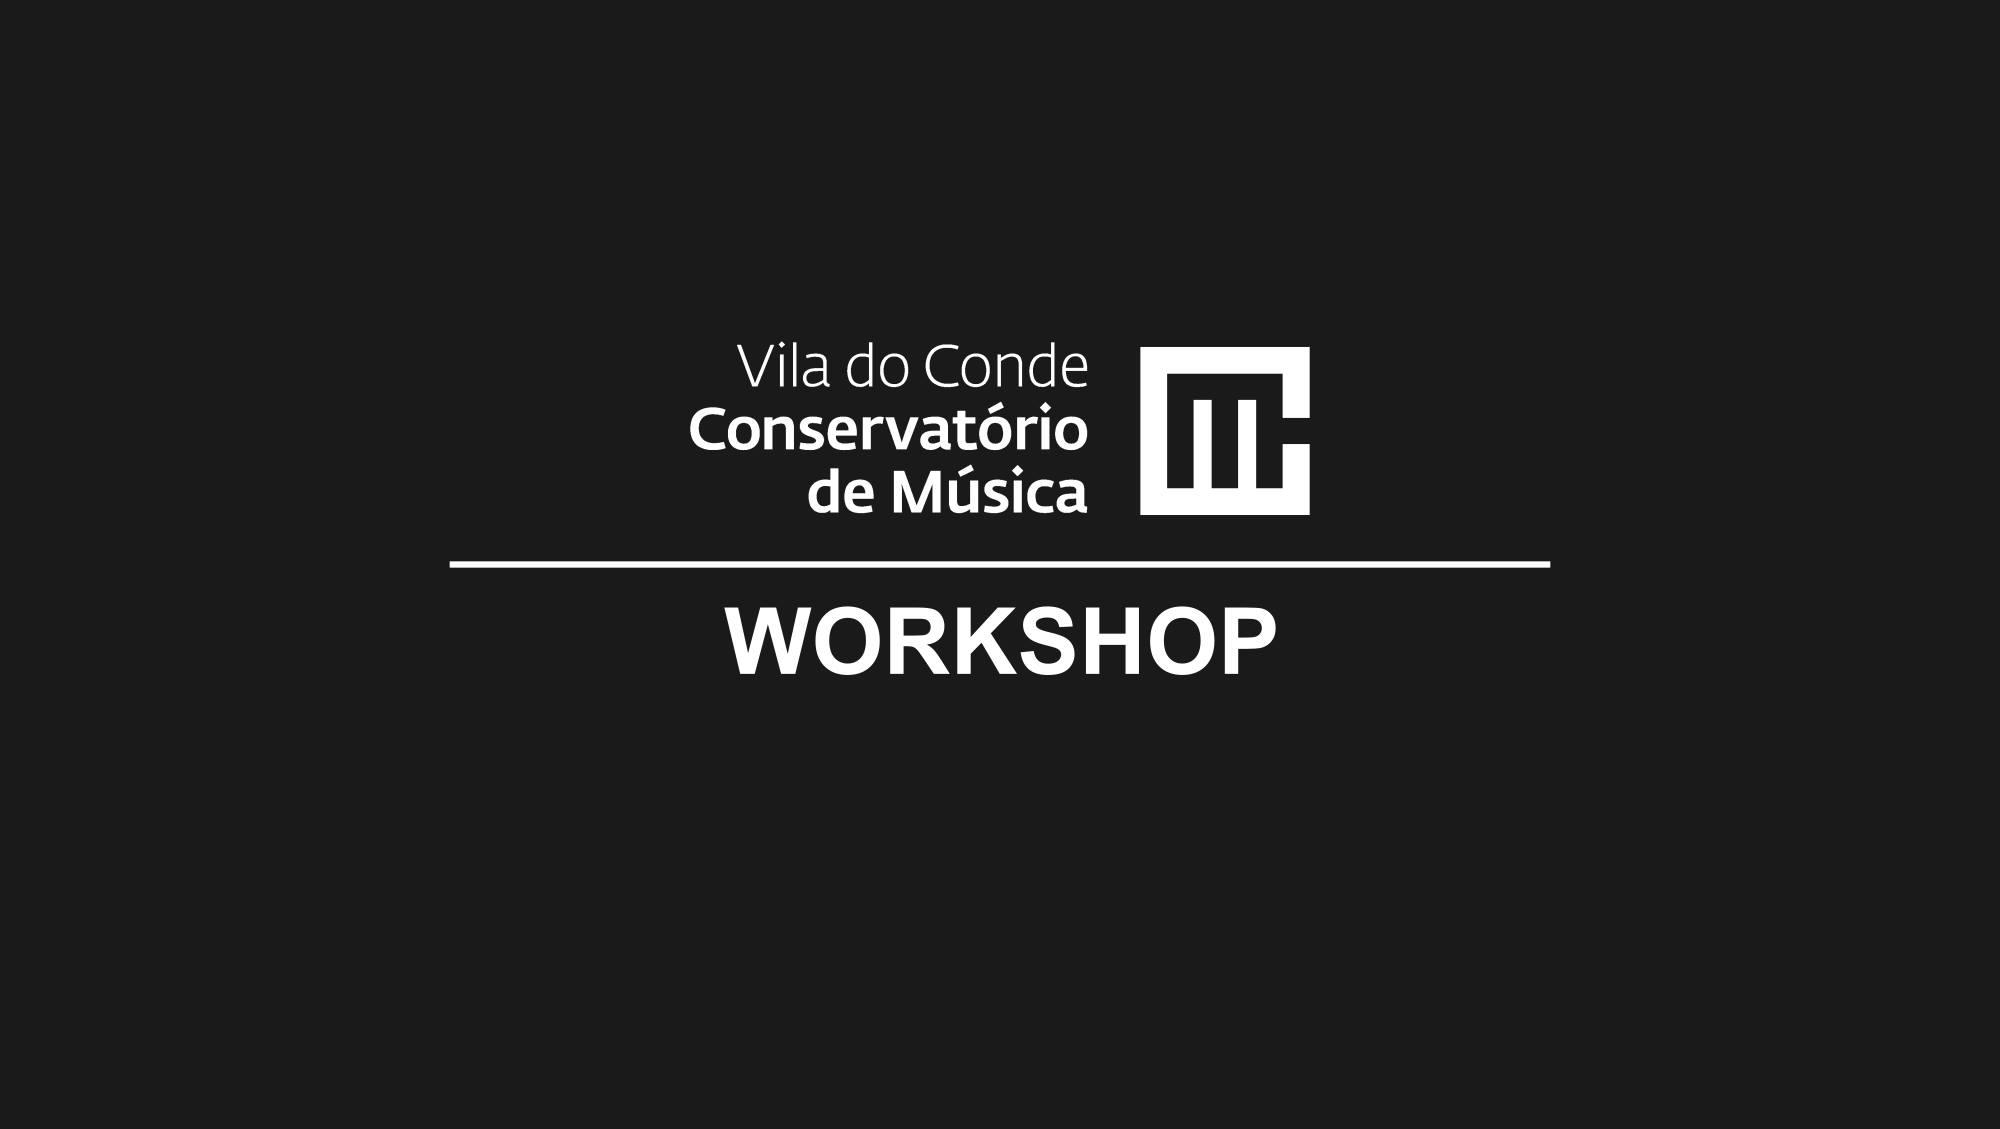 Workshop de Cravo - Catarina Rocha